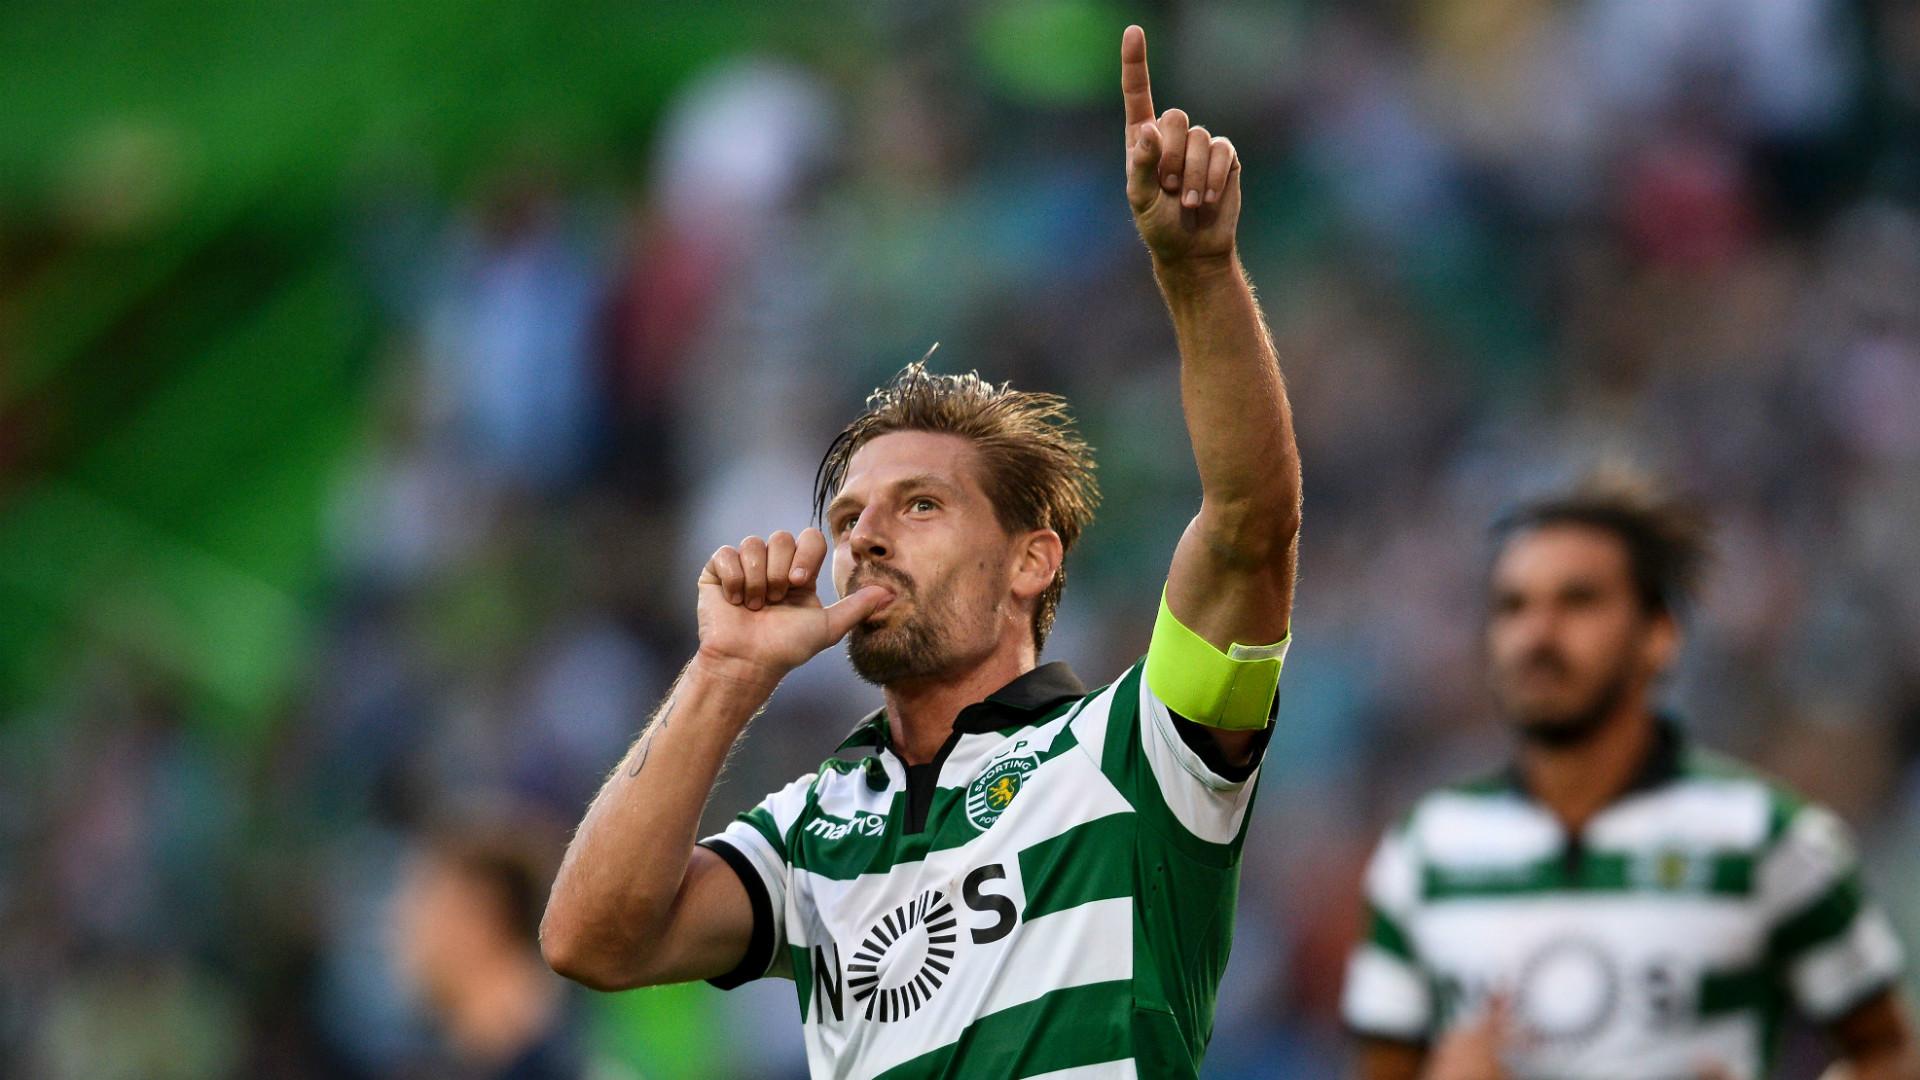 Adrien Silva Sporting VfL Wolfsburg 30072016